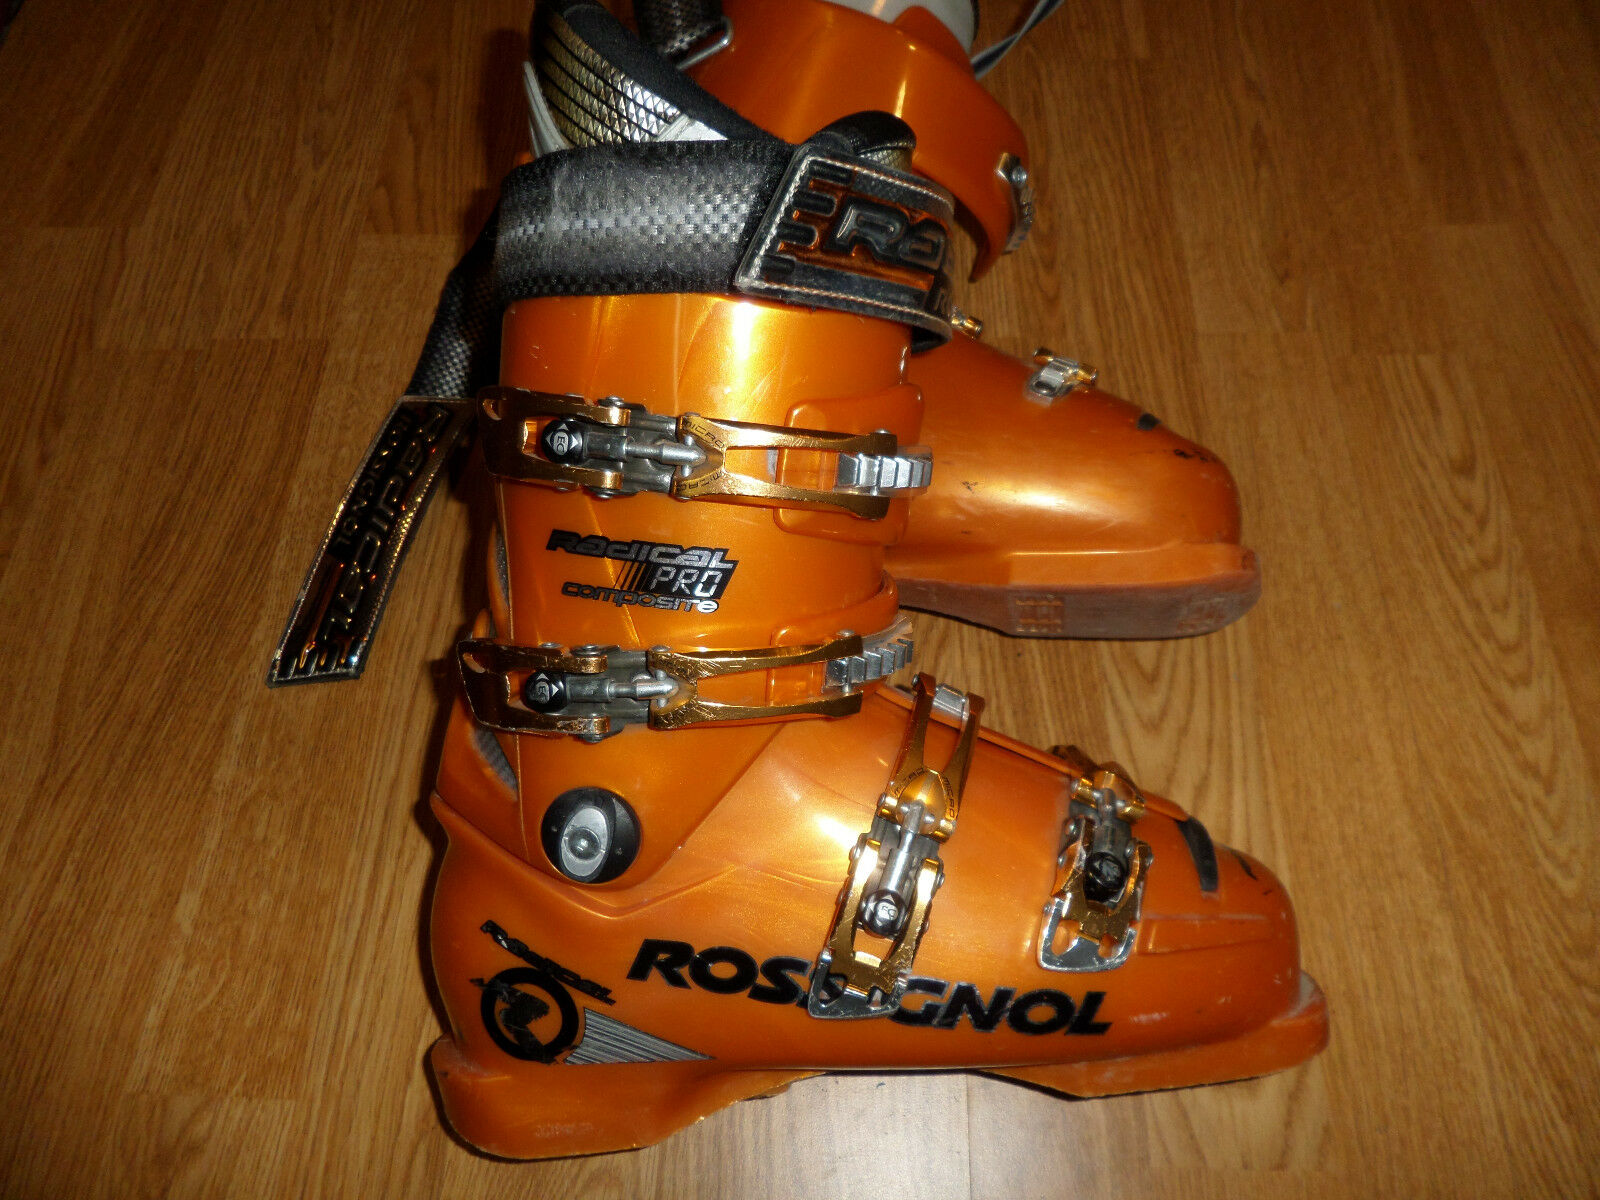 ROSSIGNOL RADICAL PRO COMPOSITE RACING SKI BOOTS MEN'S 8 - 8.5